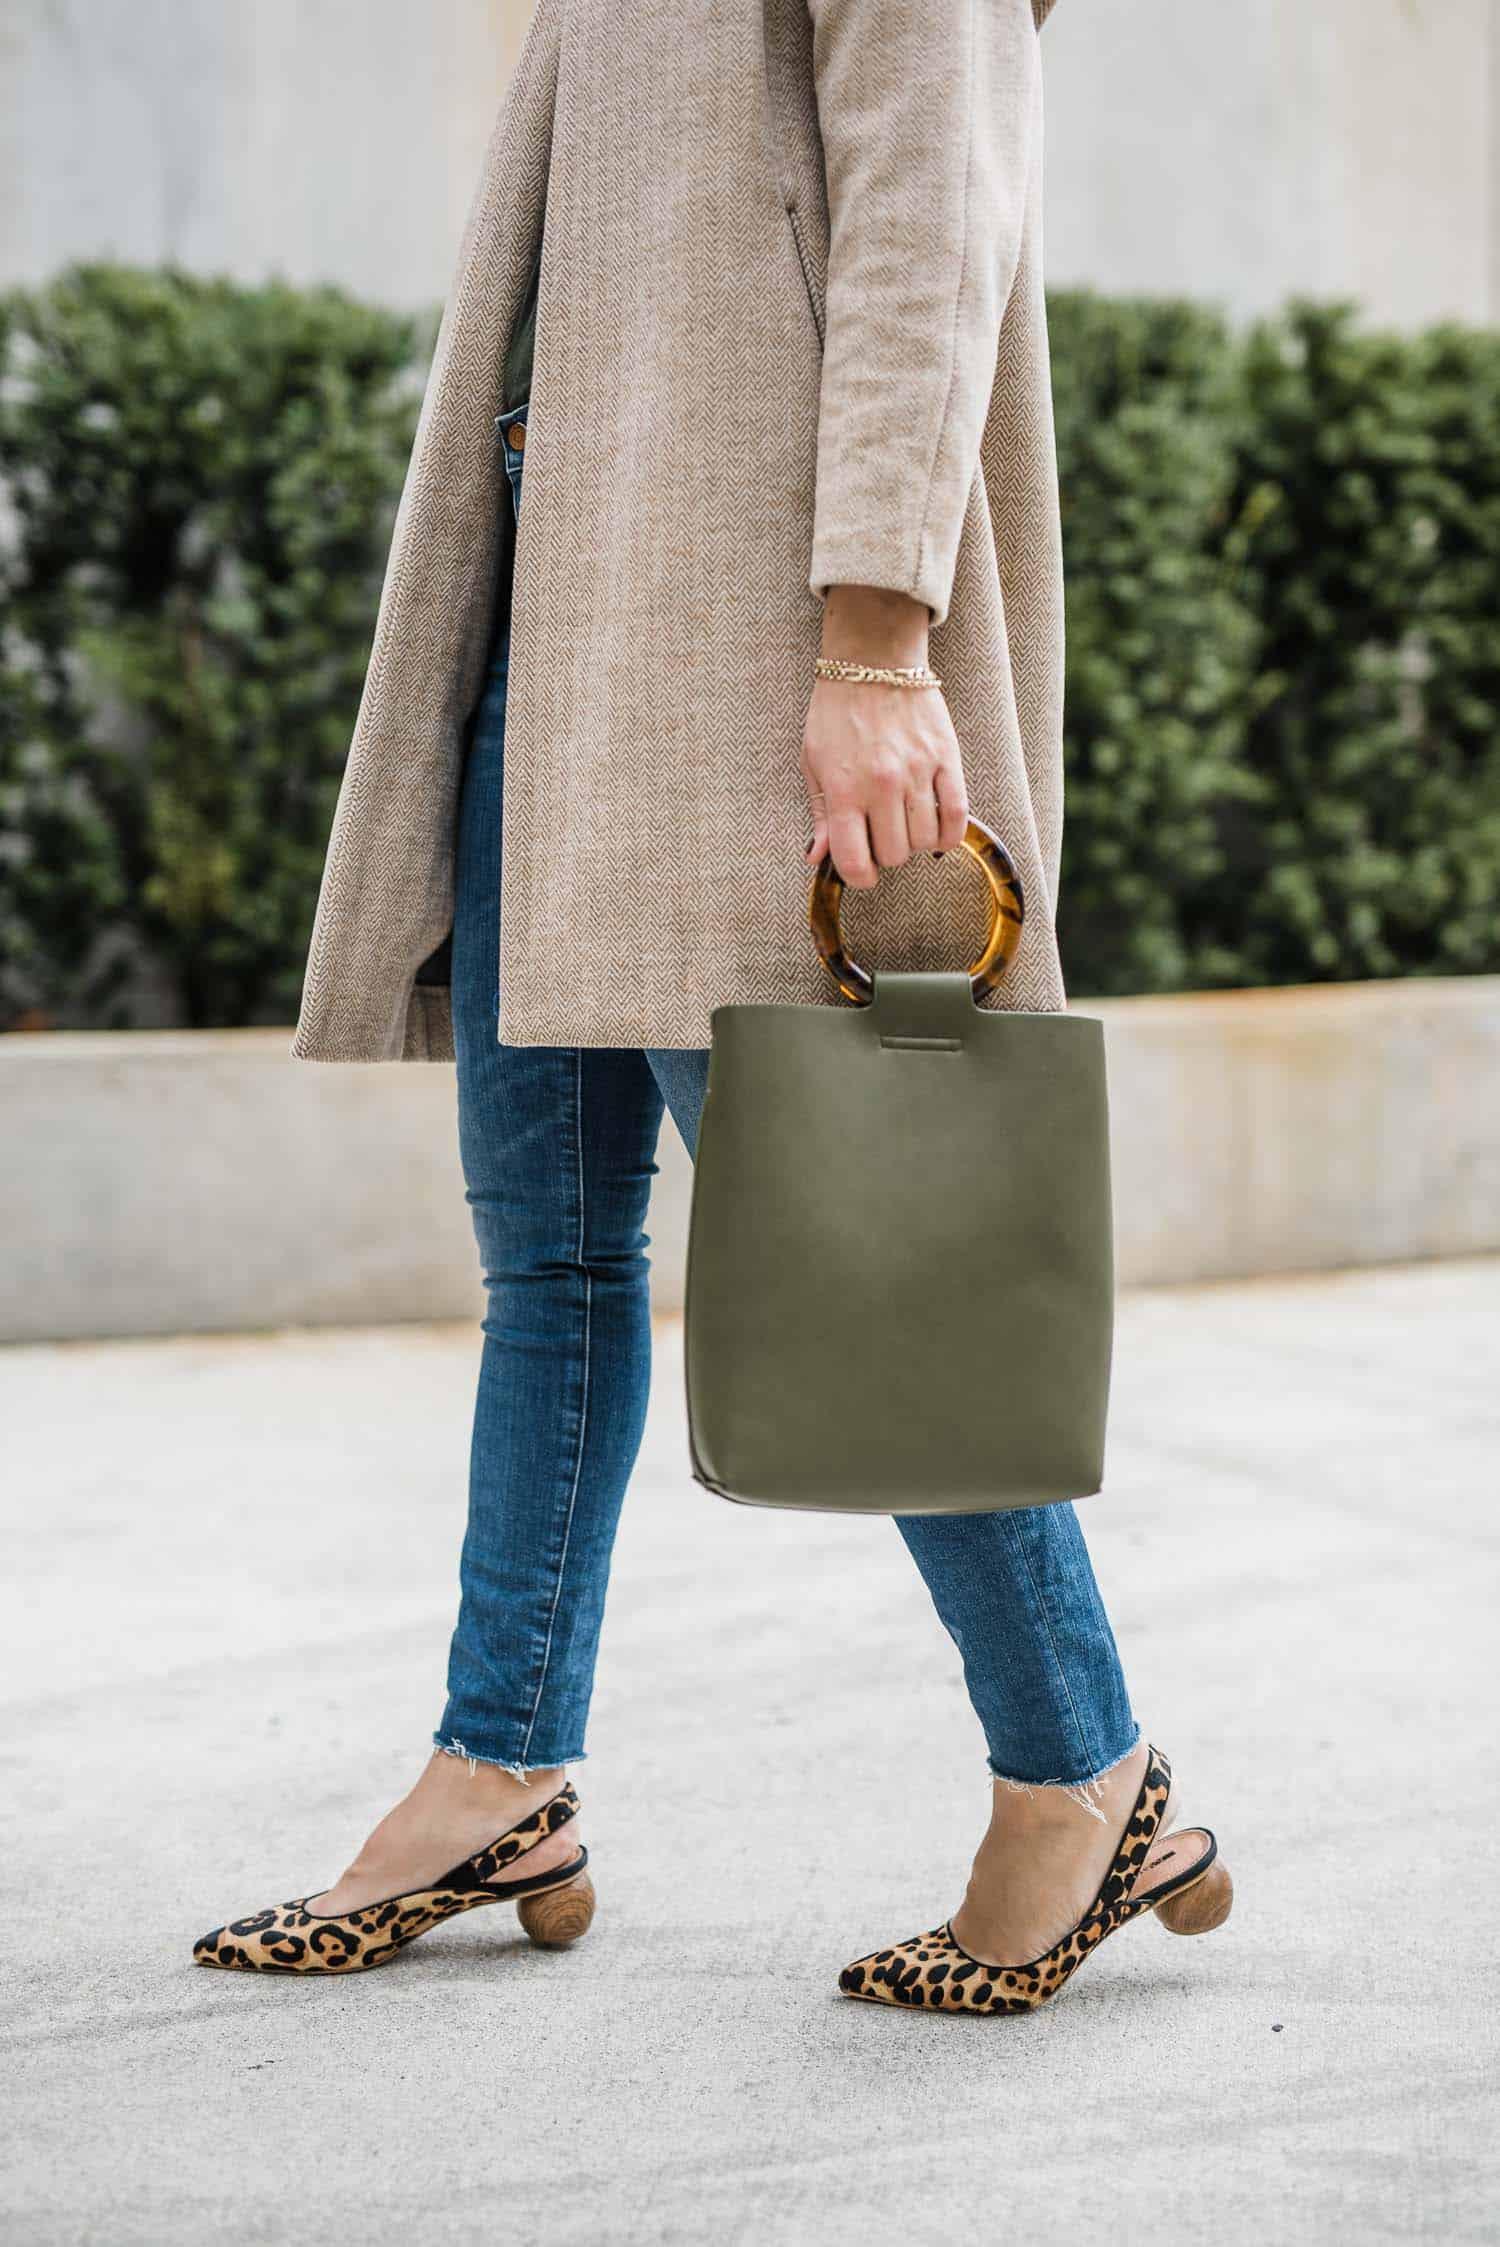 Anthropologie Bag • Matiko Leopard Heels • Madewell Jeans